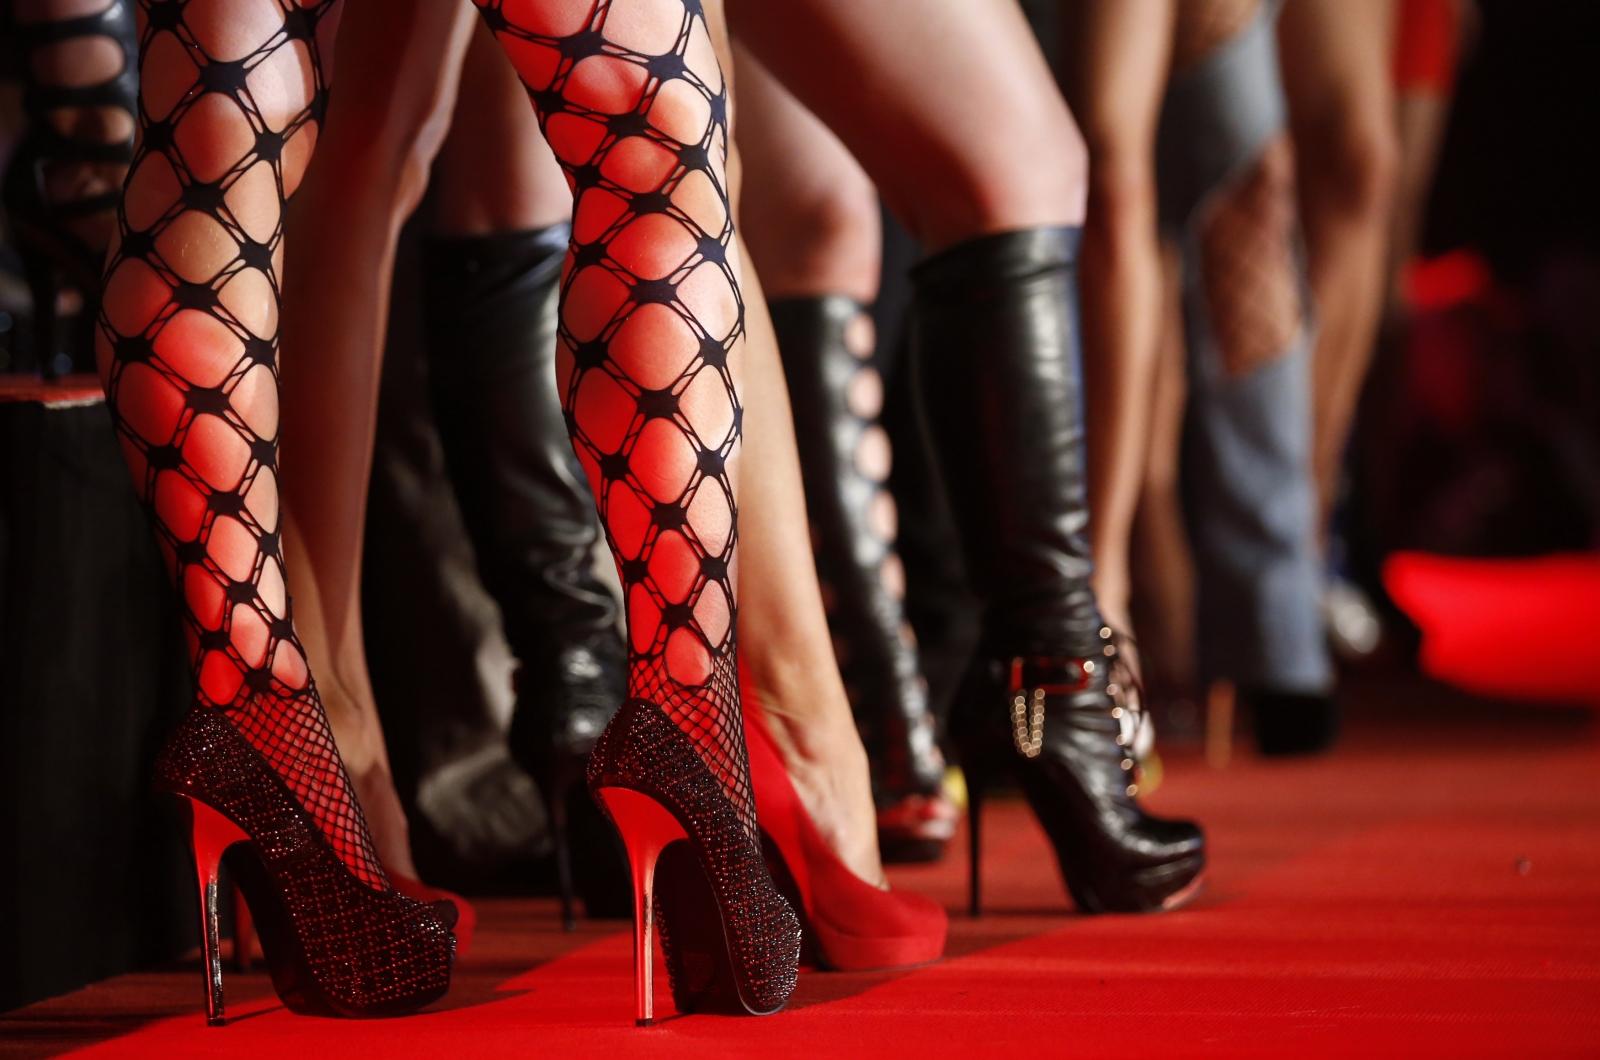 Rola misaki sex slave scandal japanese adult star denies deal with